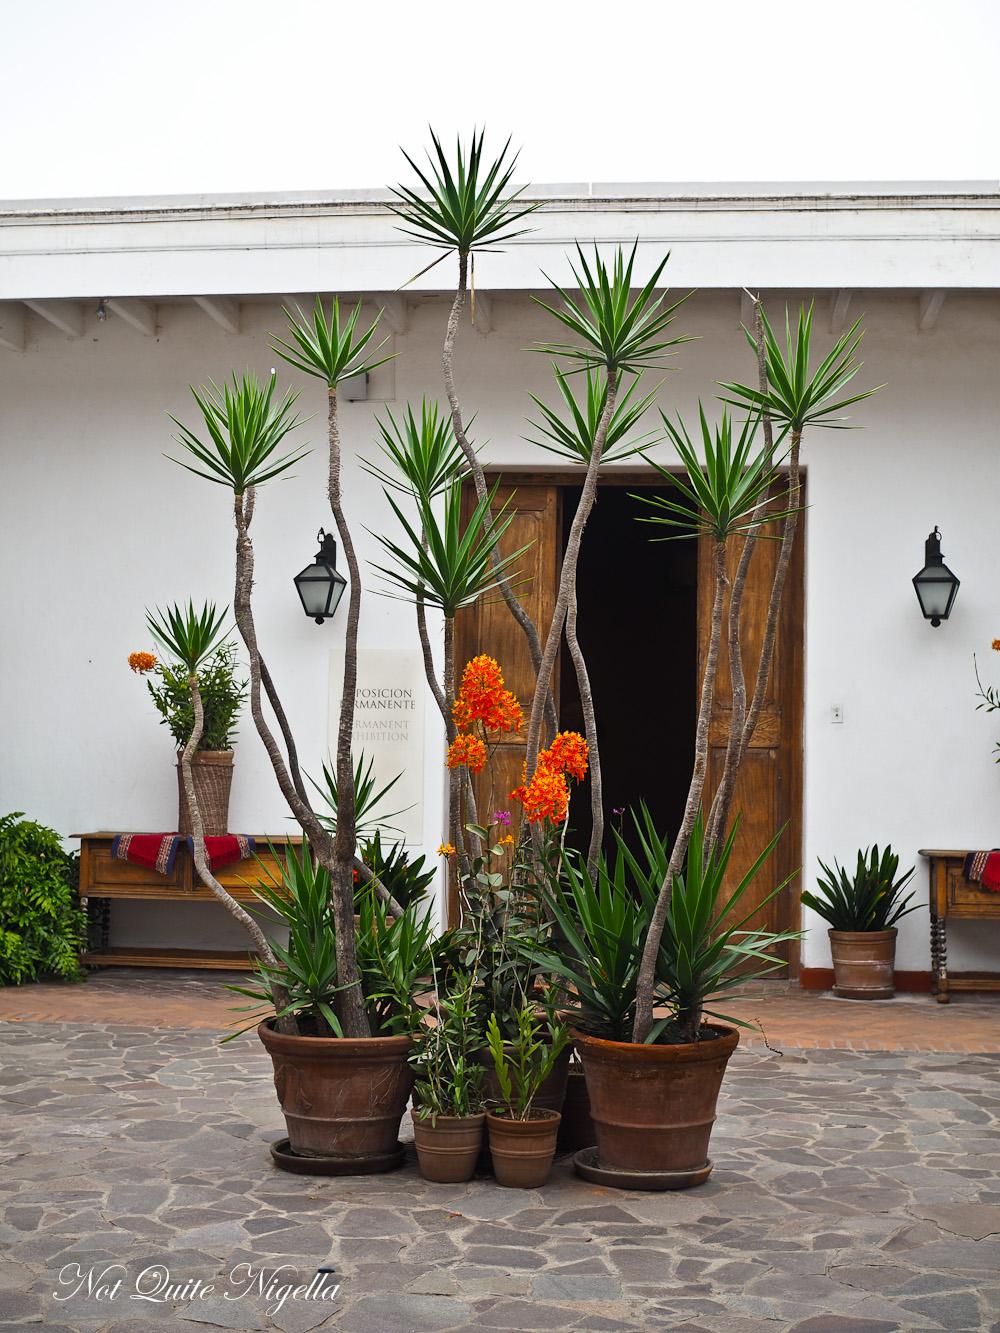 Lima Peru Food Tour